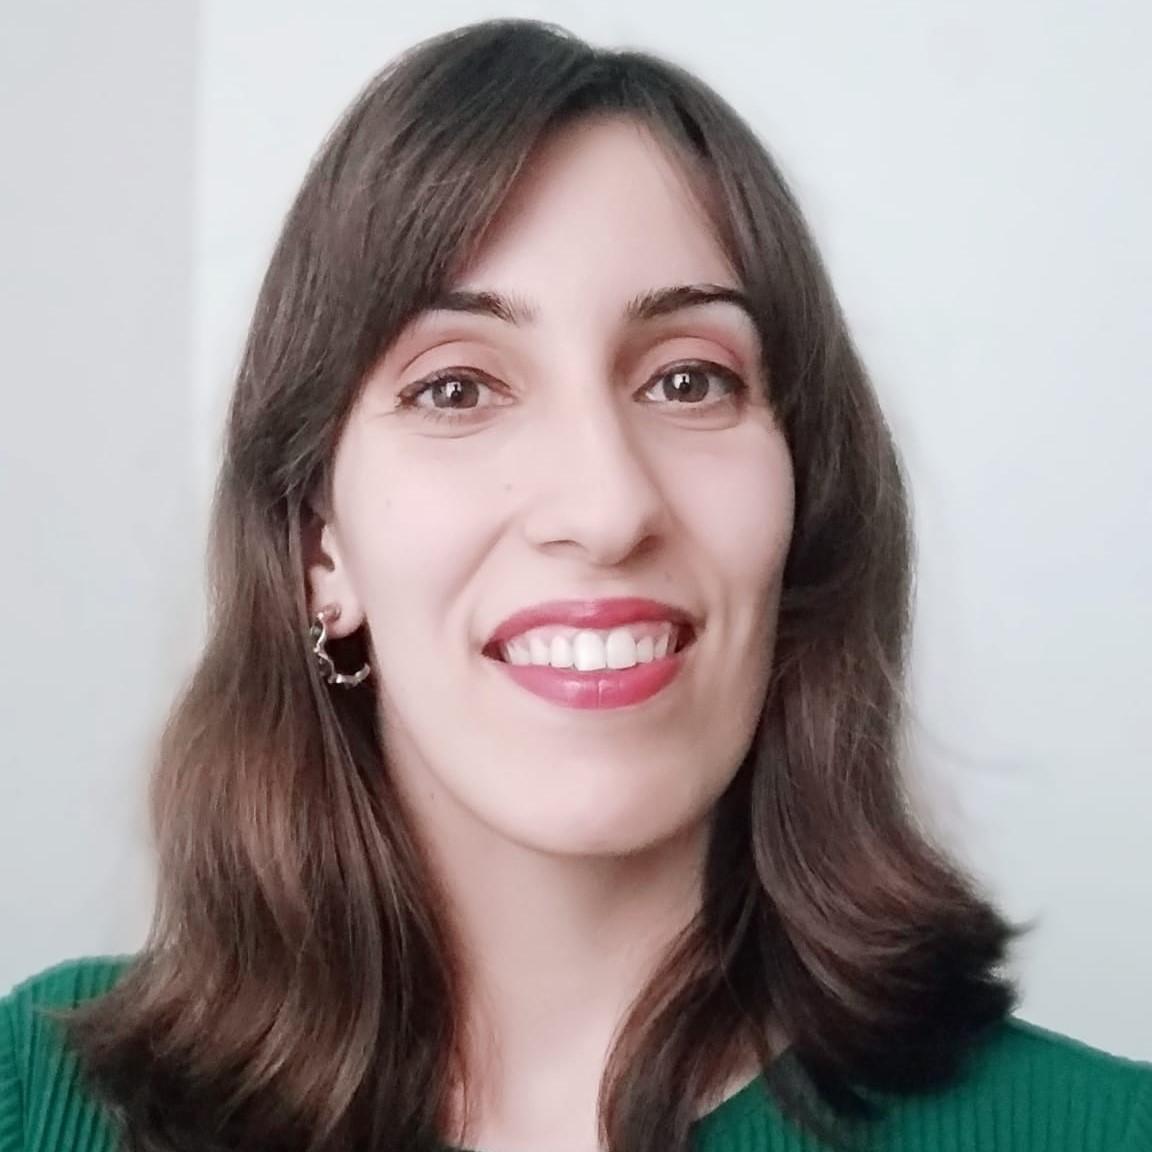 María Rodriguez Canary Green